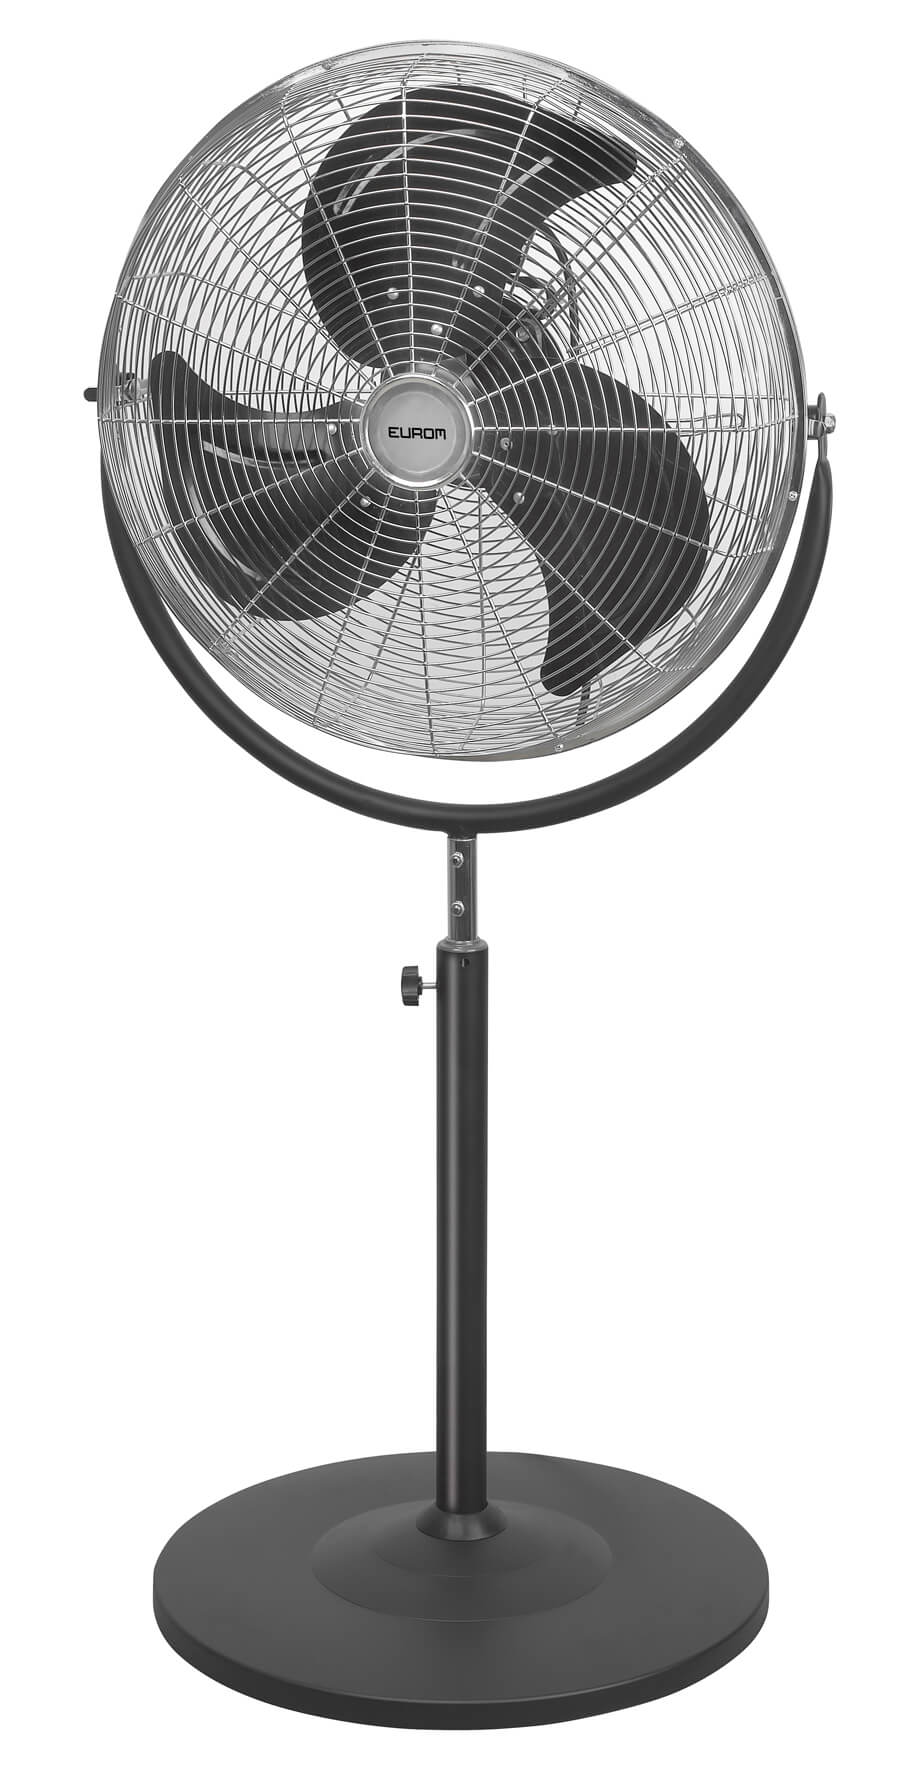 Eurom HVF18-2S Staand model ventilator 46 cm professioneel vloermodel